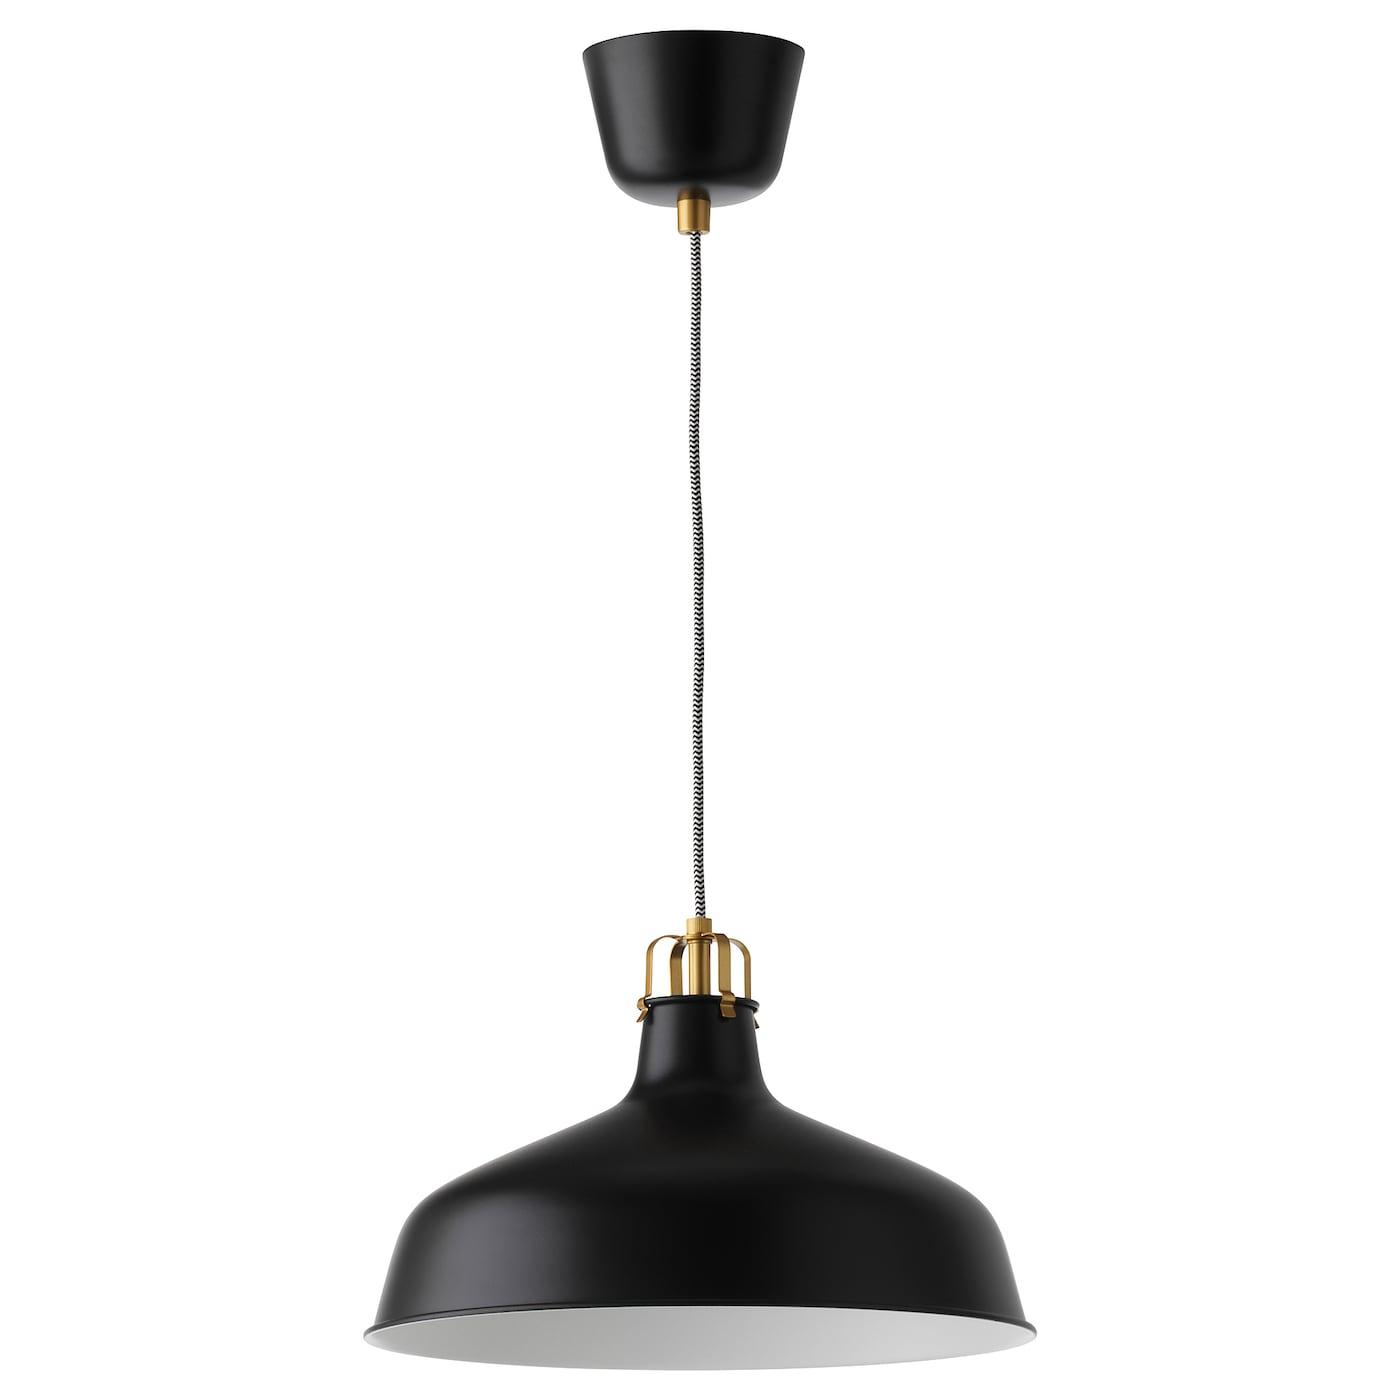 Ikea Ranarp Ceiling Lamp: Ceiling Lights & LED Ceiling Lights